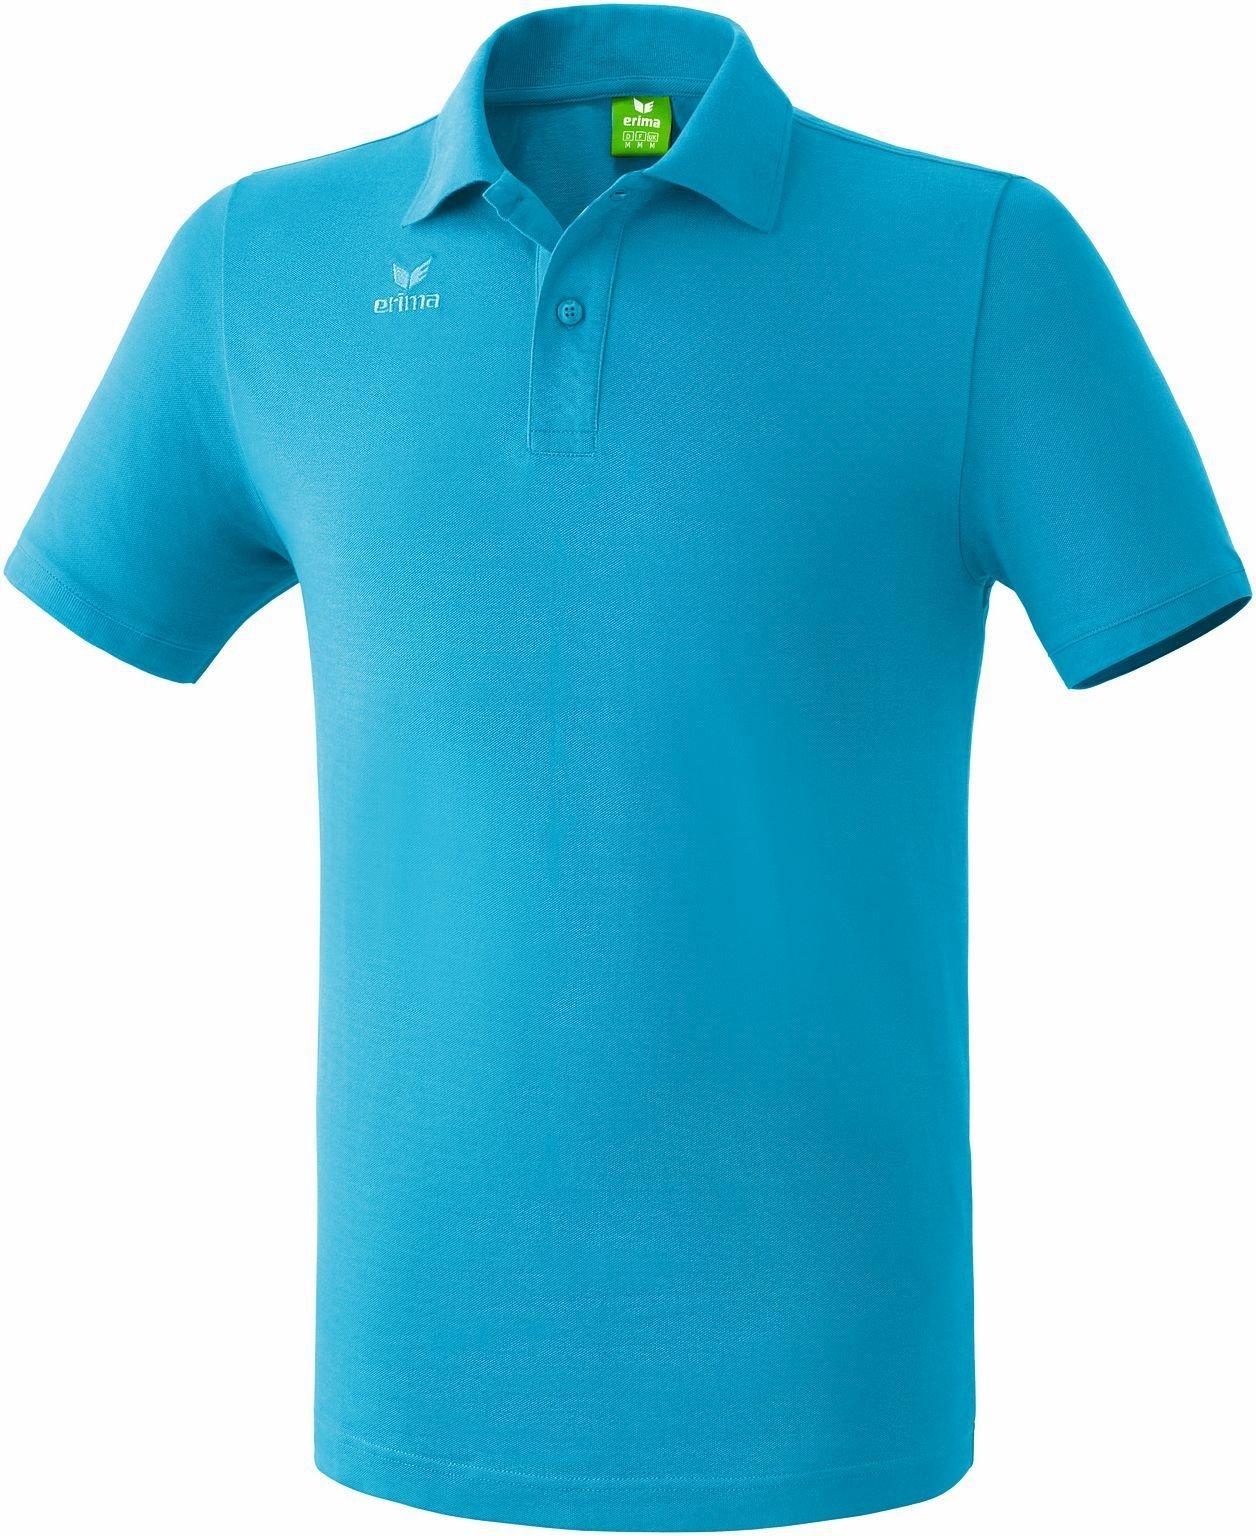 Baumwolle Poloshirt Kinder a0211400